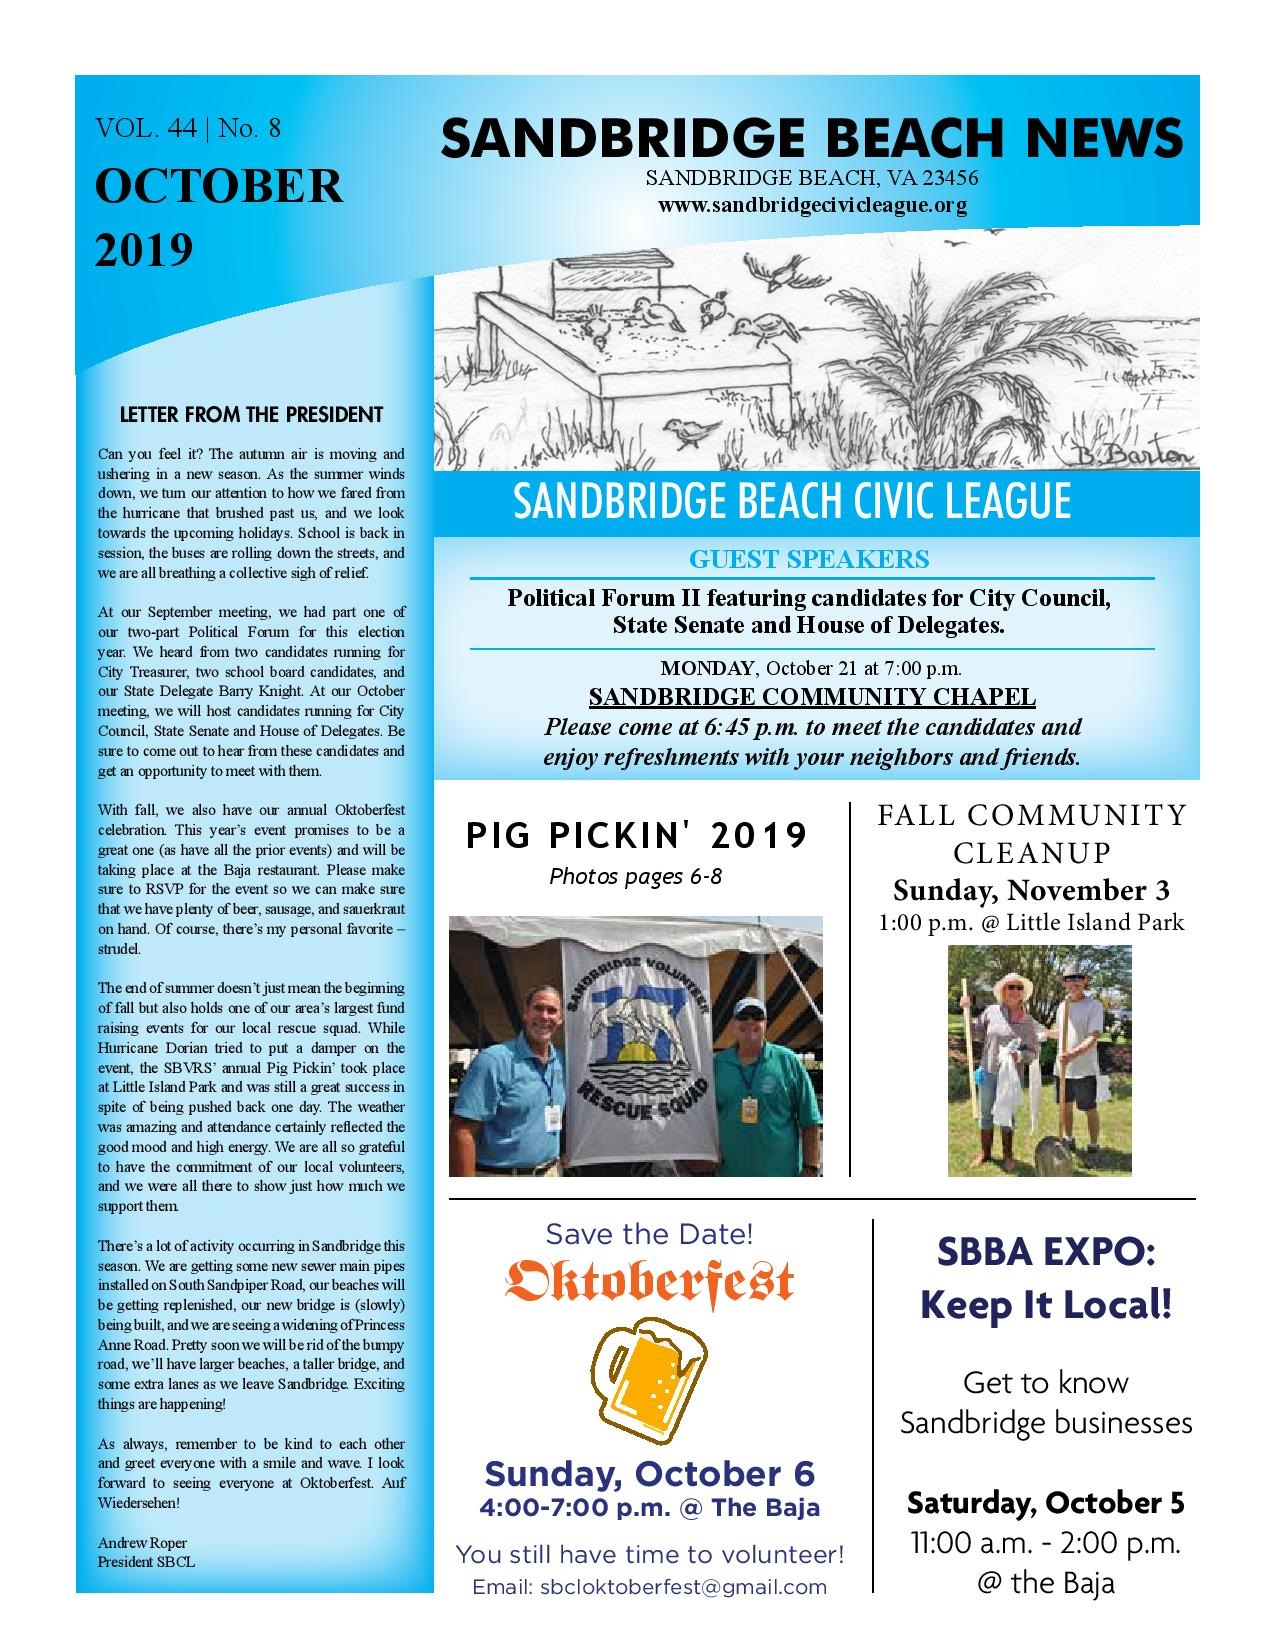 SBCL Newsletter Oct 2019